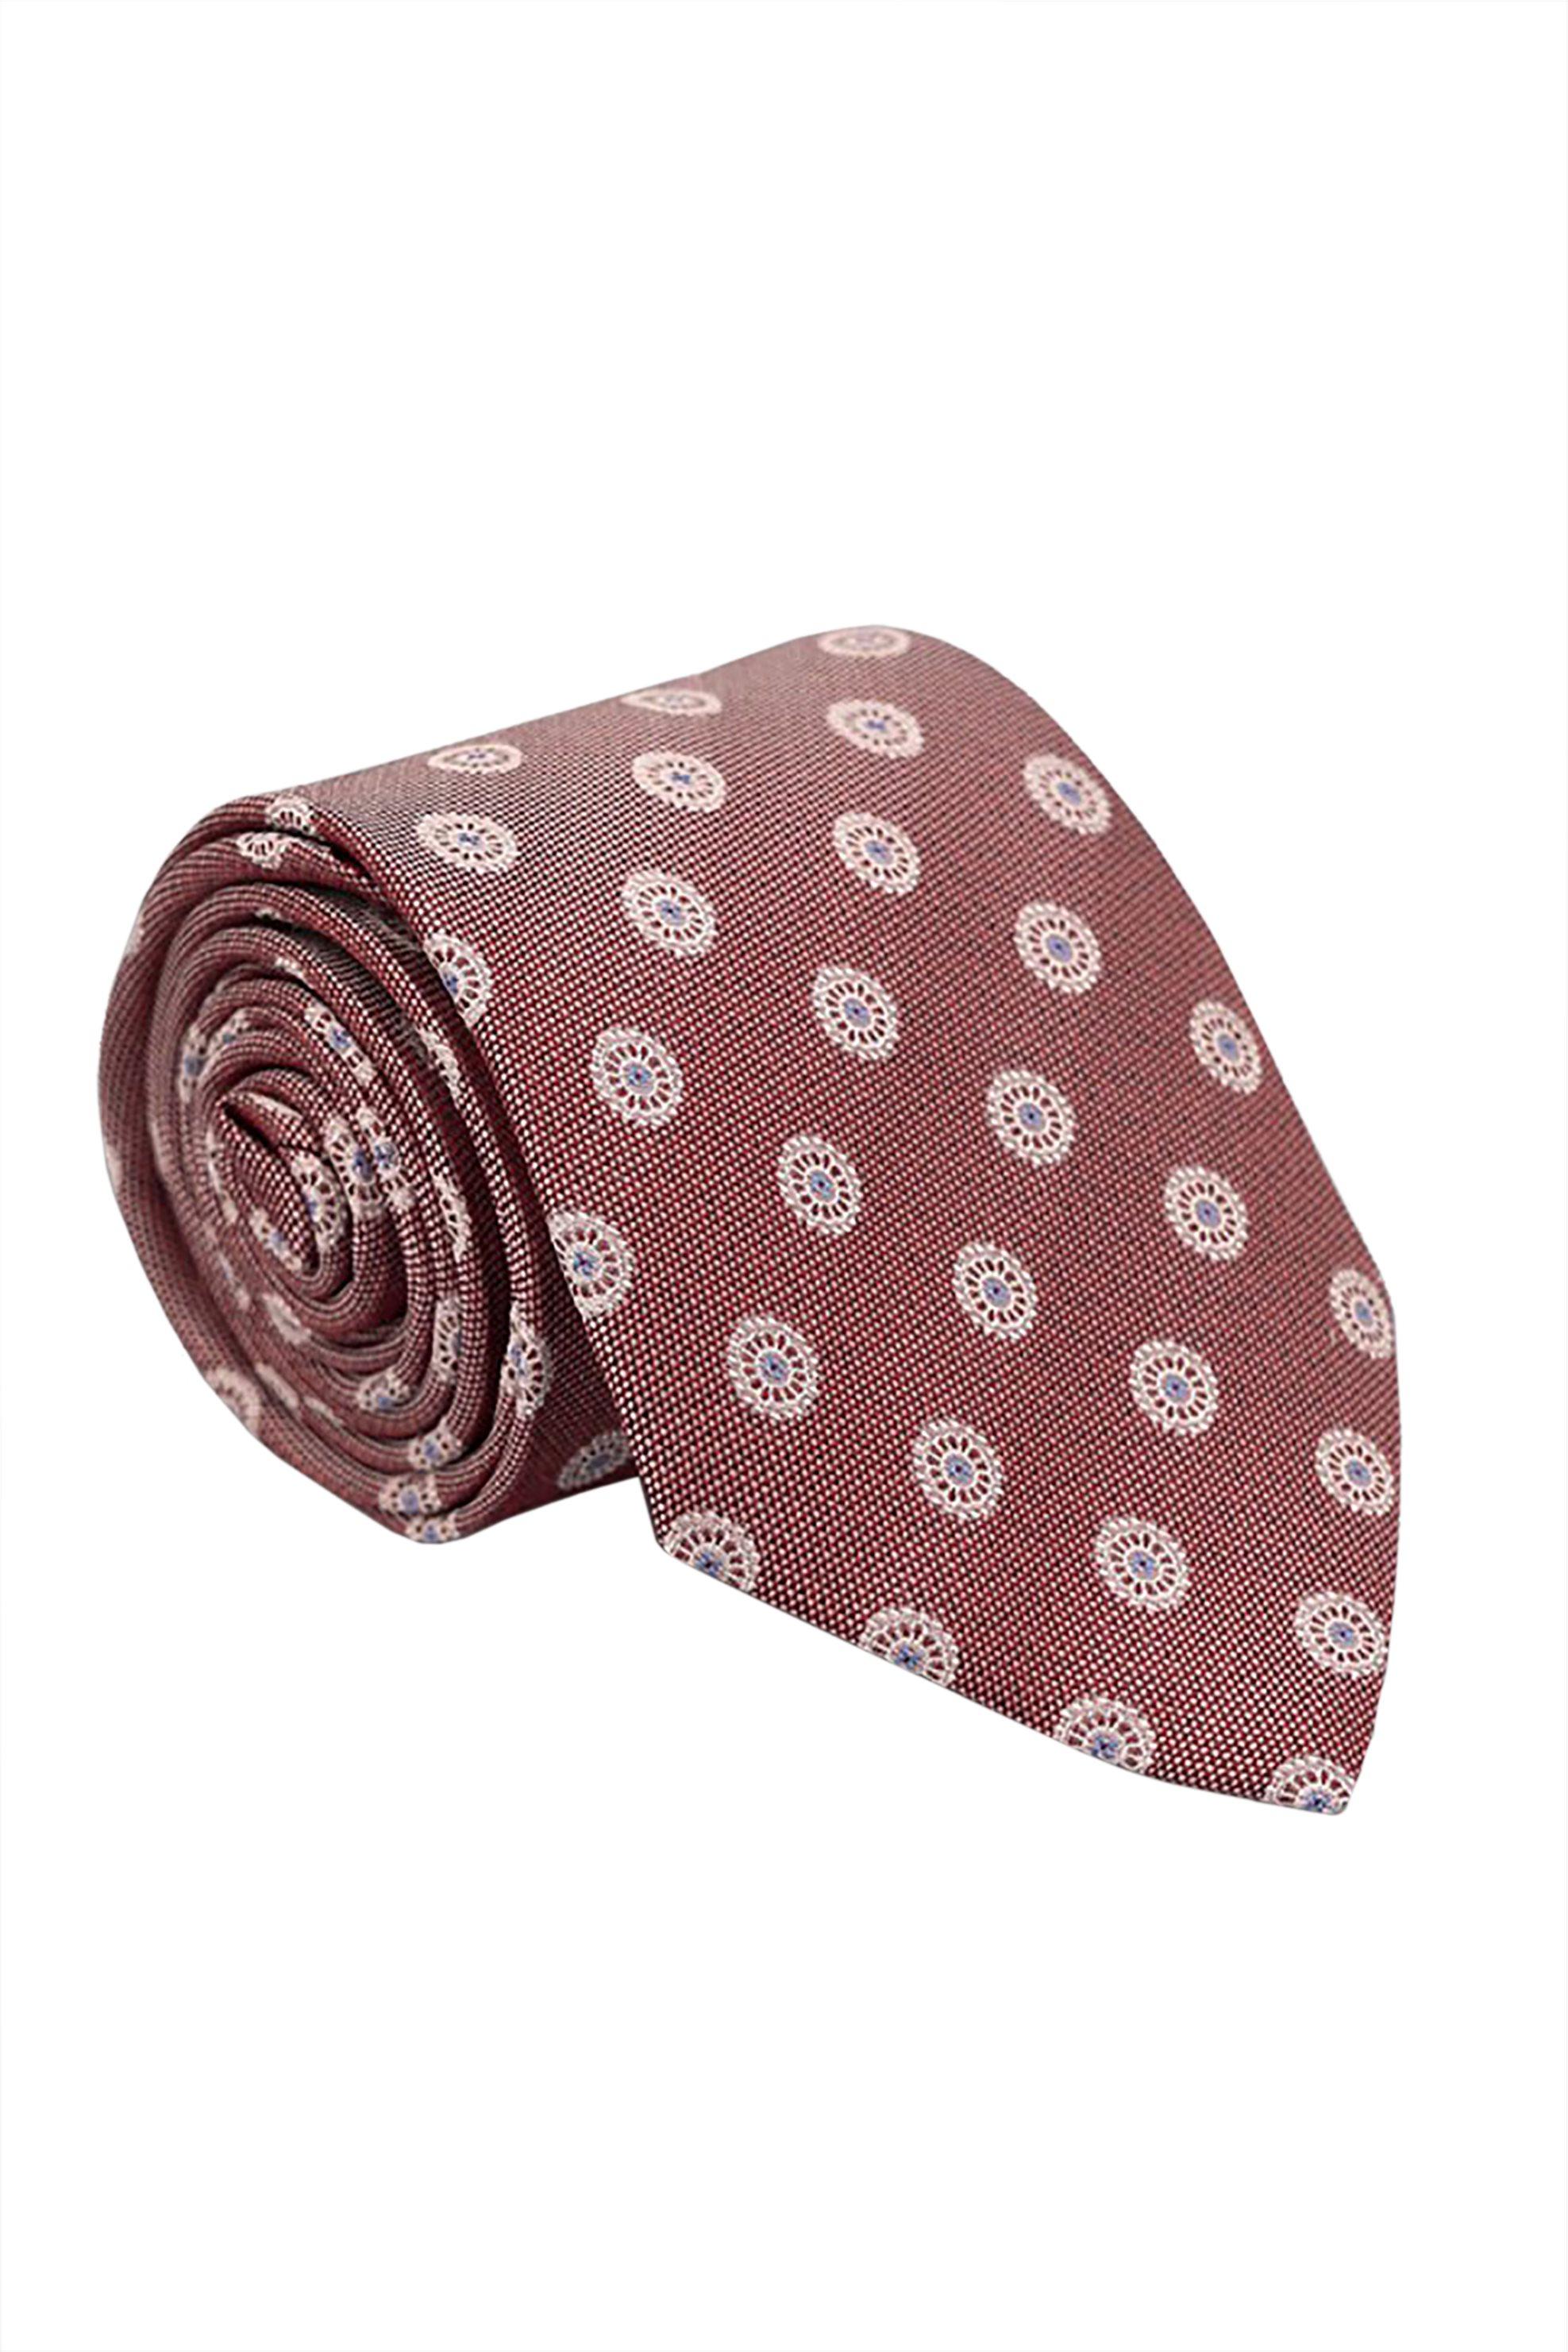 Oxford Company ανδρική μεταξωτή γραβάτα με μικροσχέδιο - TIE51-411.04 - Κεραμιδί